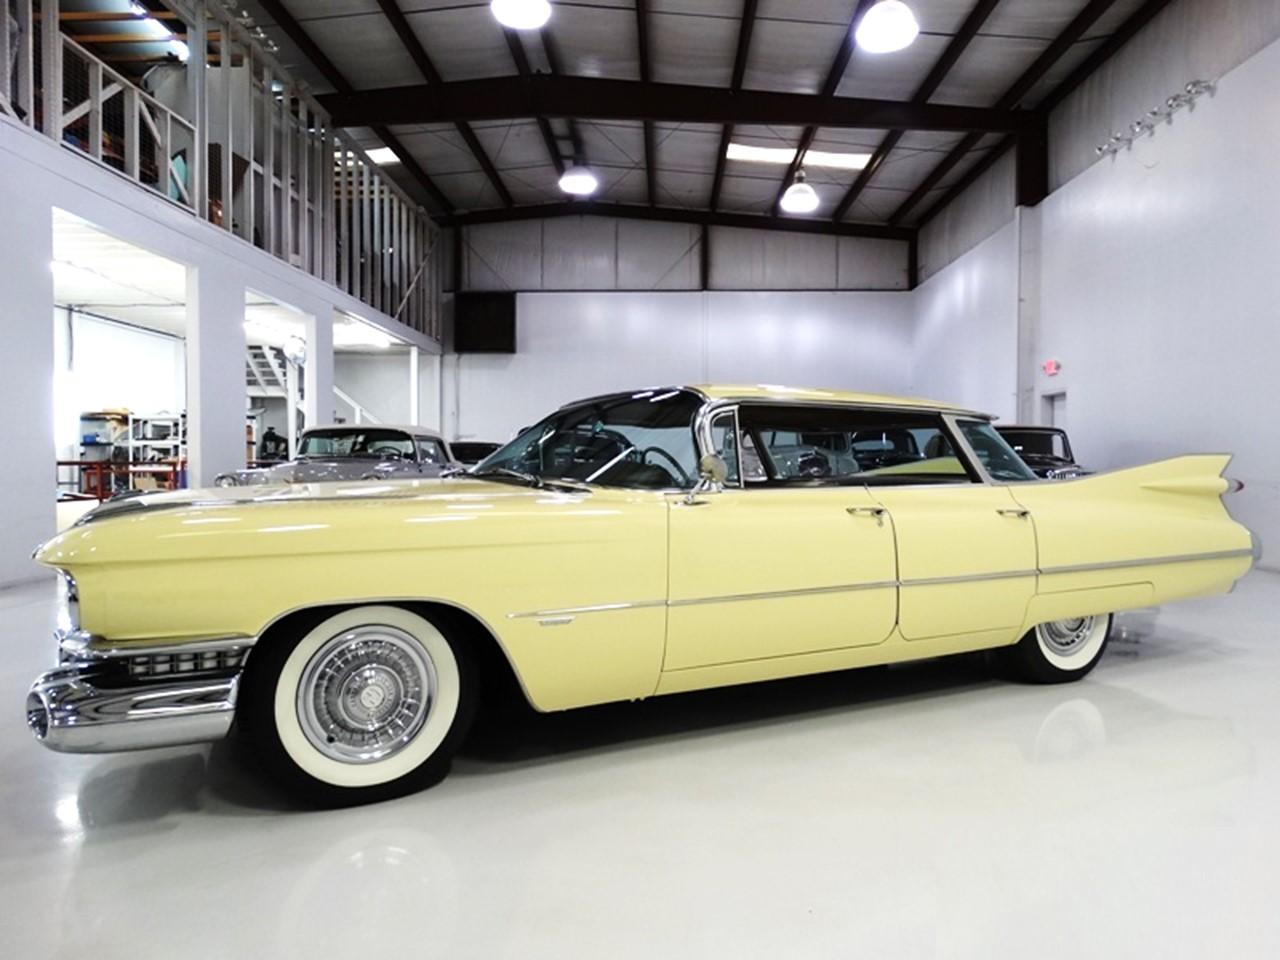 1959 Series 62 Flat Top 2